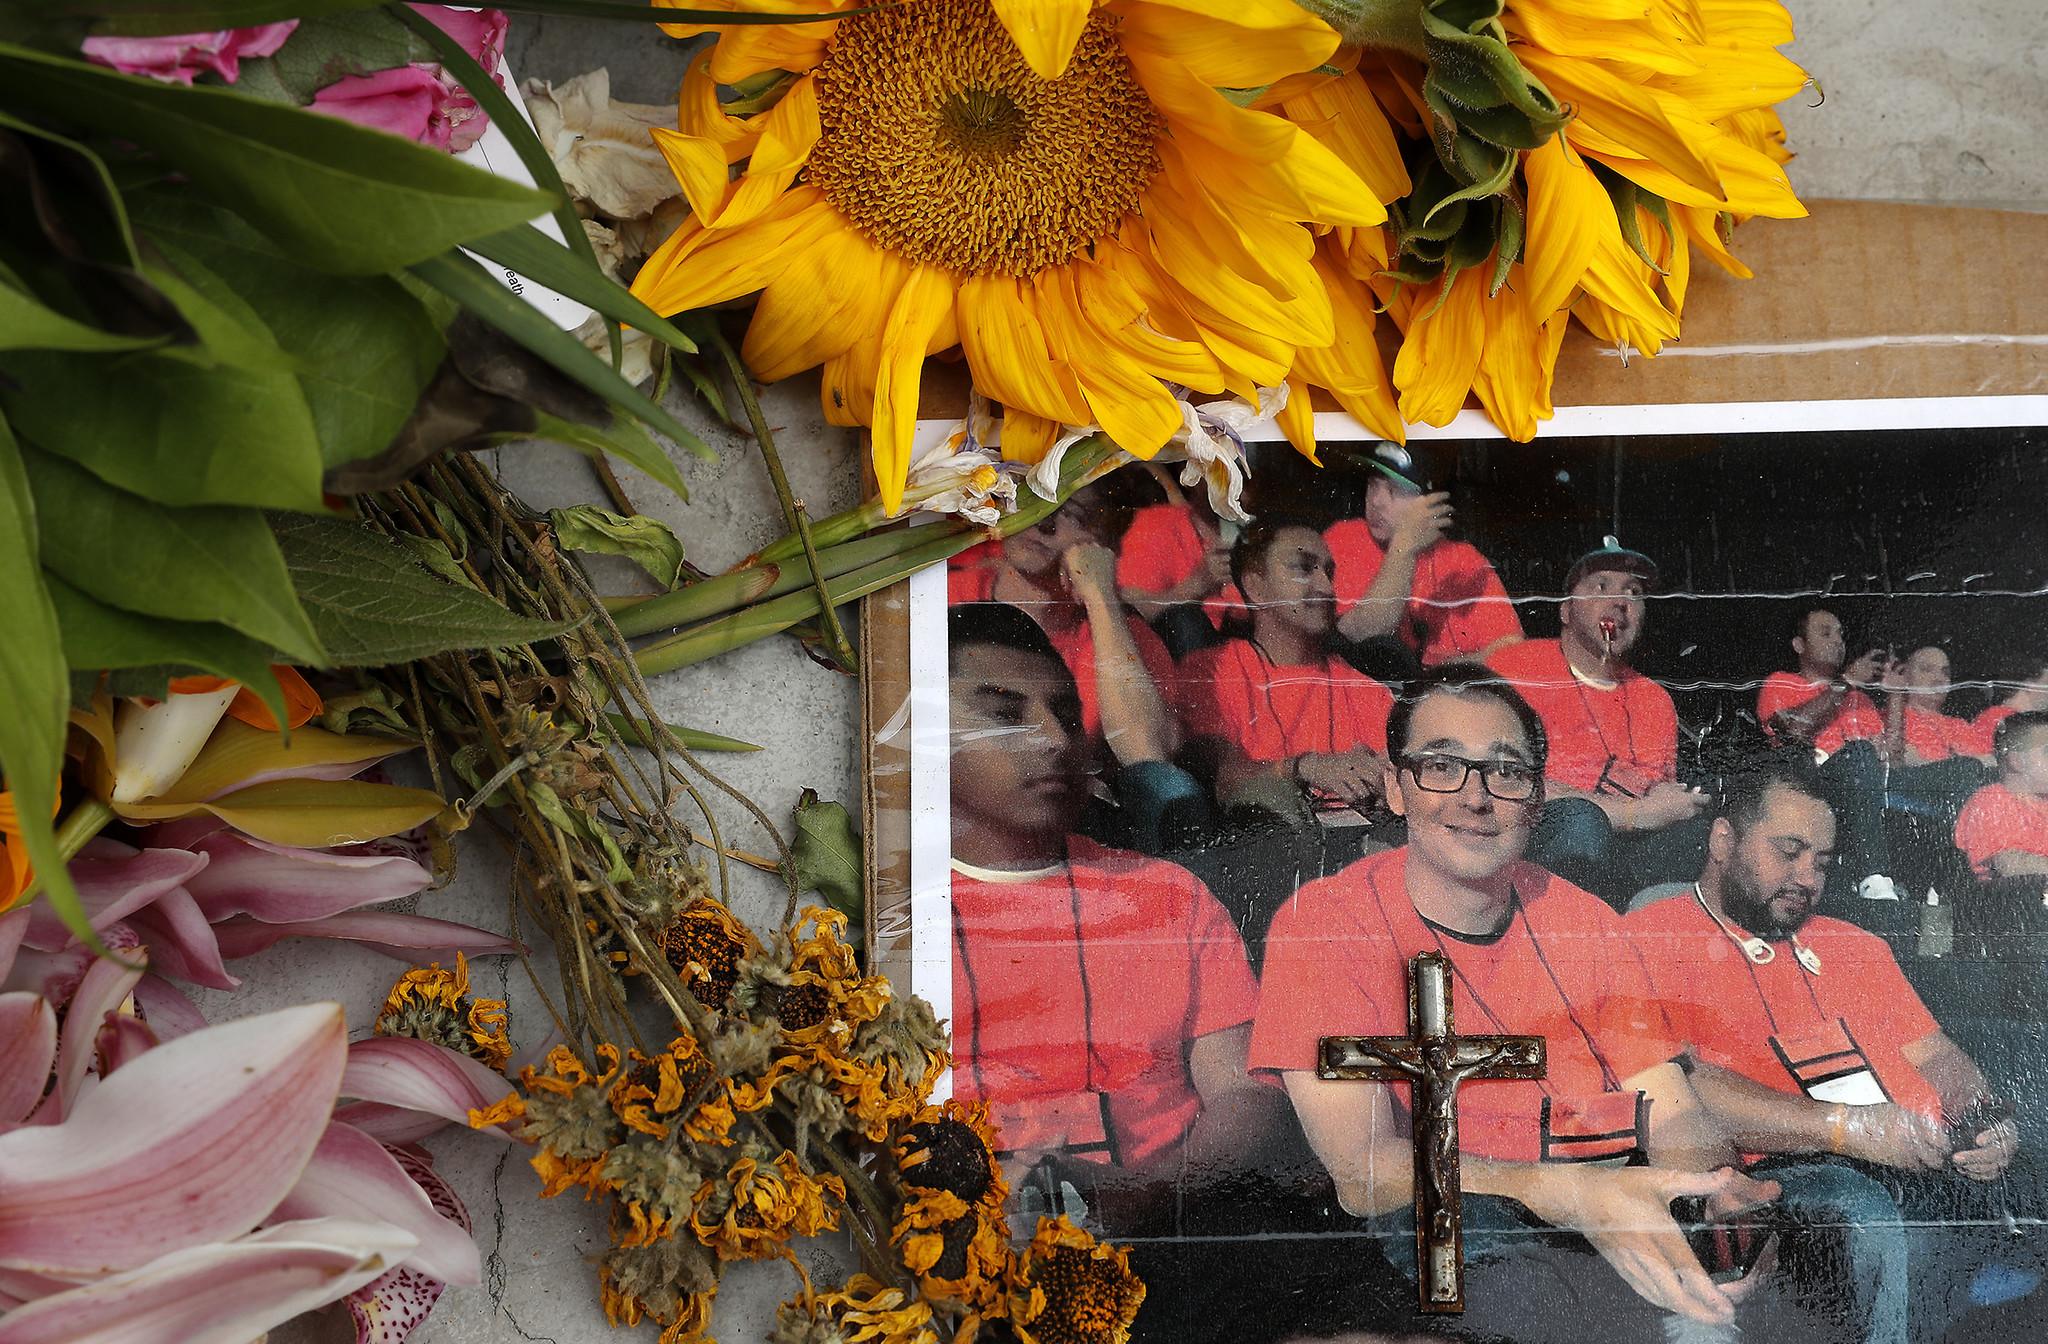 VENTURA, CA-APRIL 23, 2018: A photograph of Anthony Mele Jr., 35, (man wearing glasses) is surroun